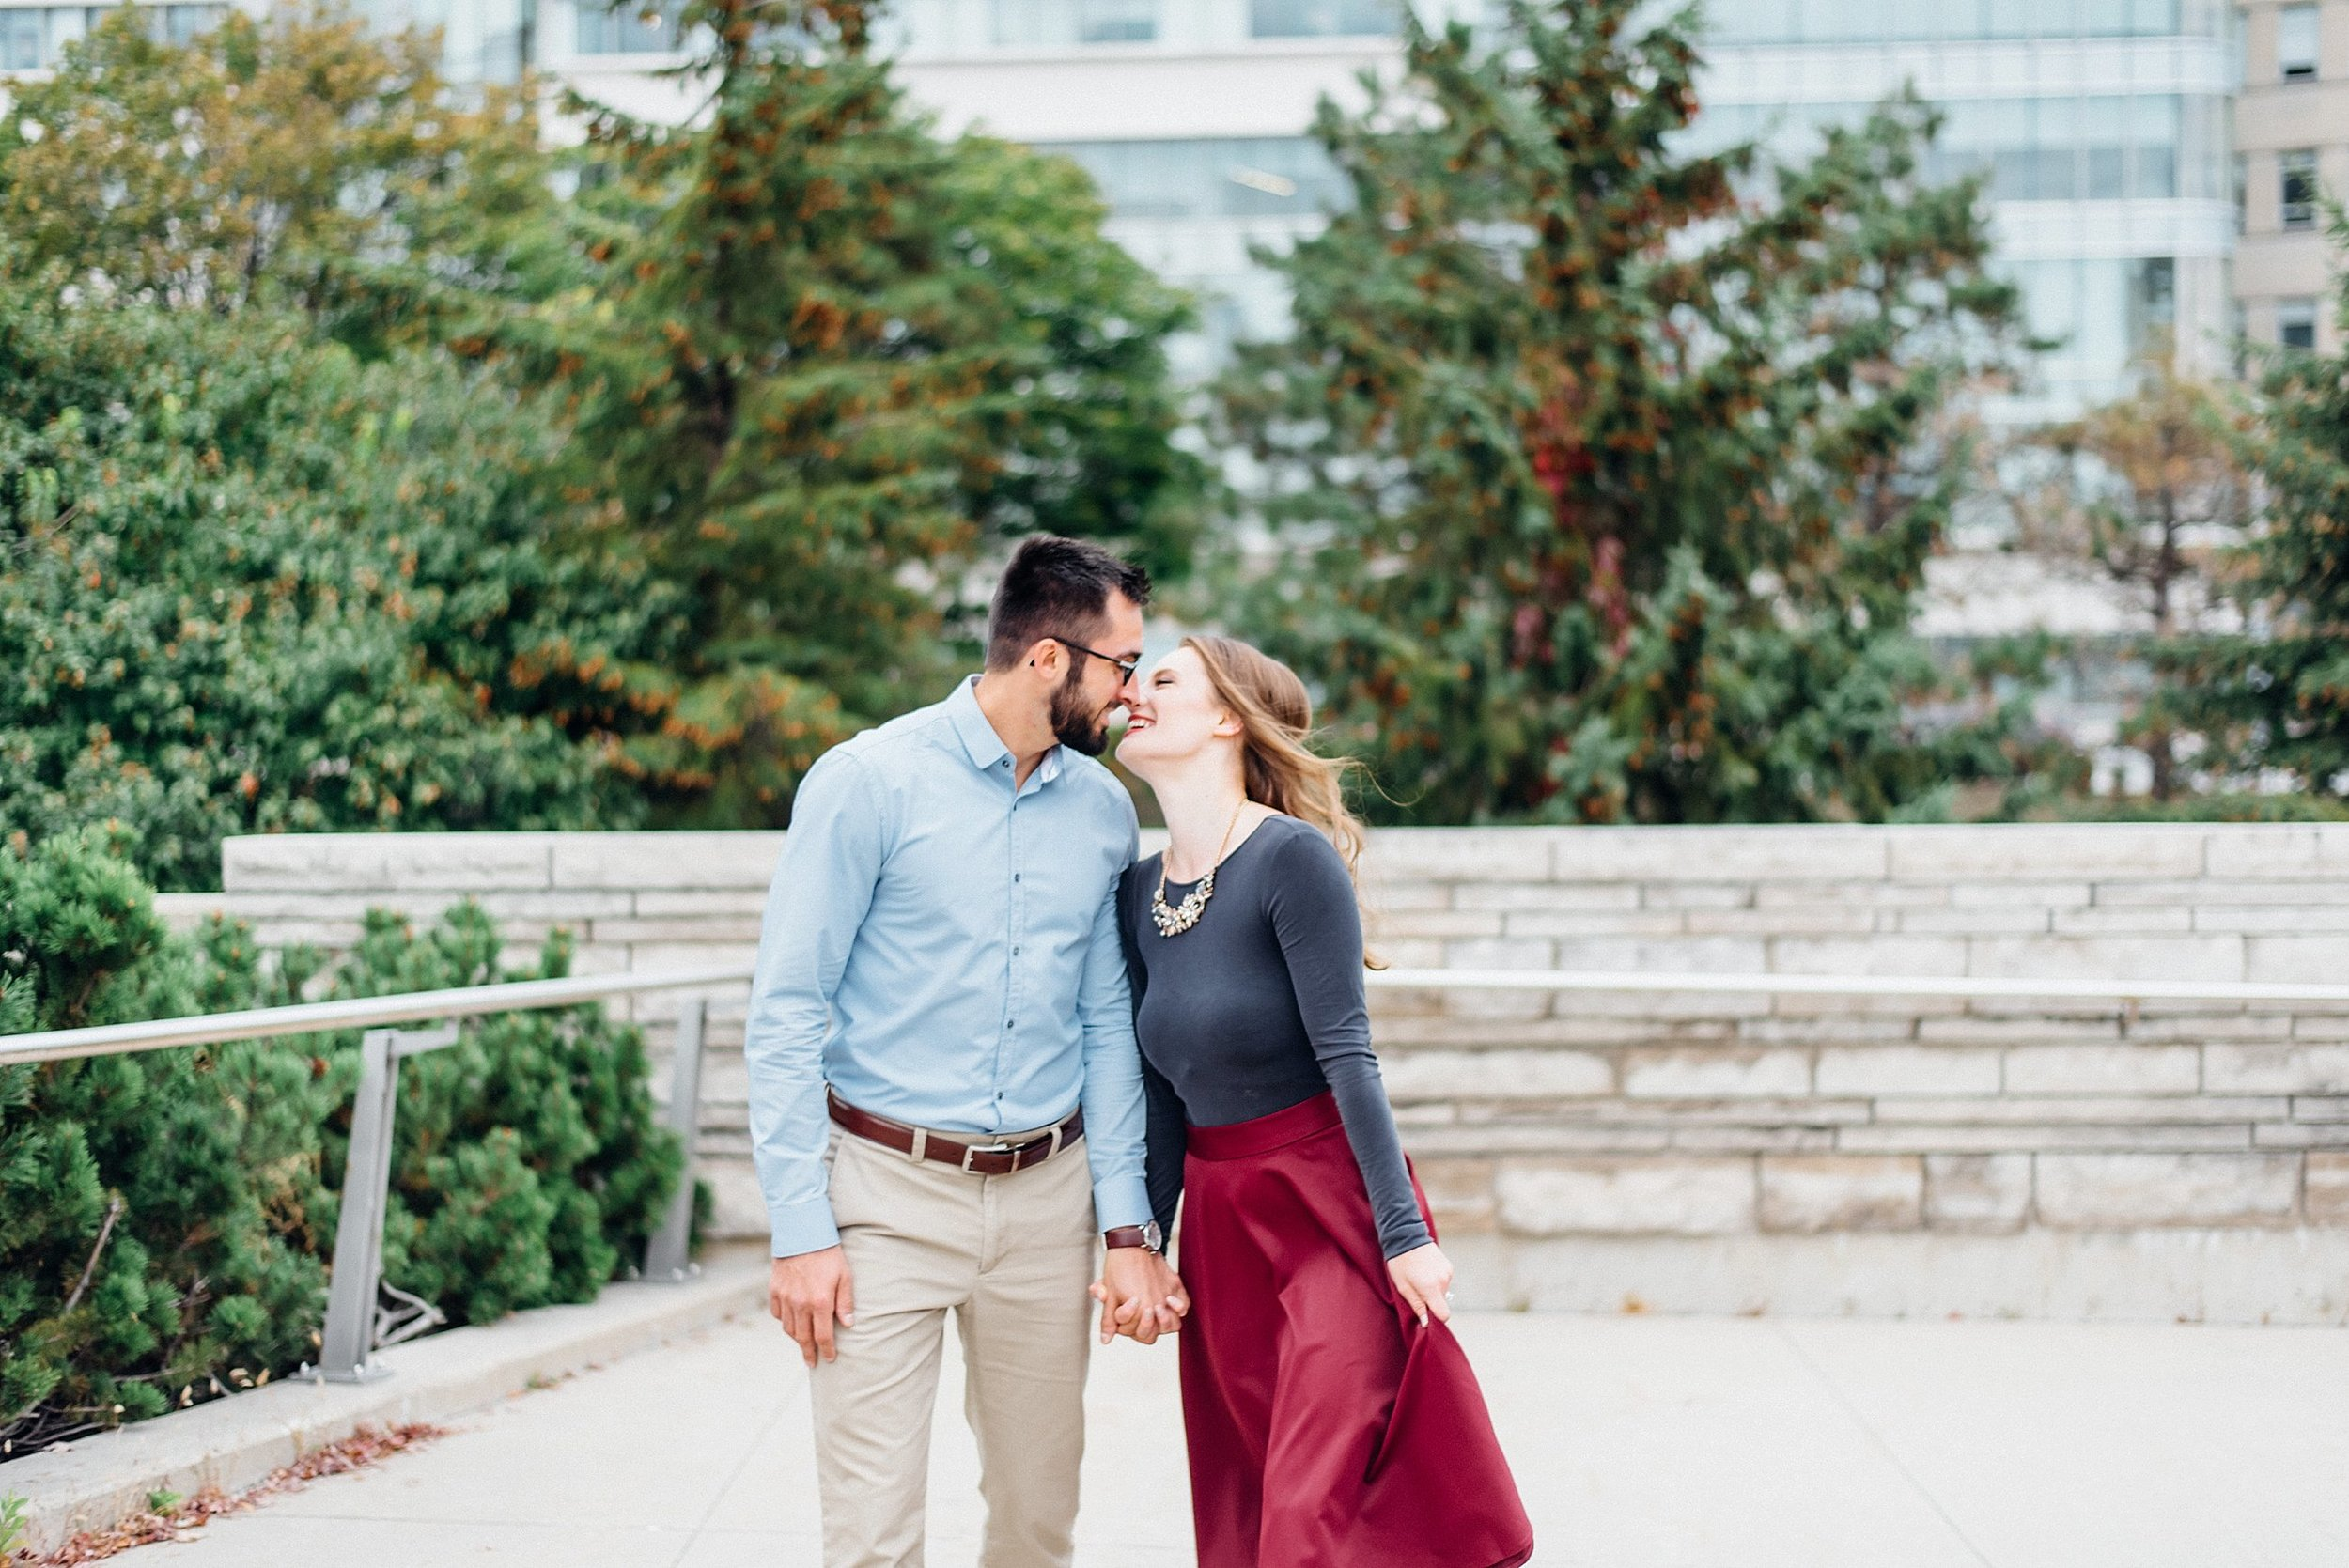 Ali and Batoul Photography - light, airy, indie documentary Ottawa wedding photographer_0133.jpg